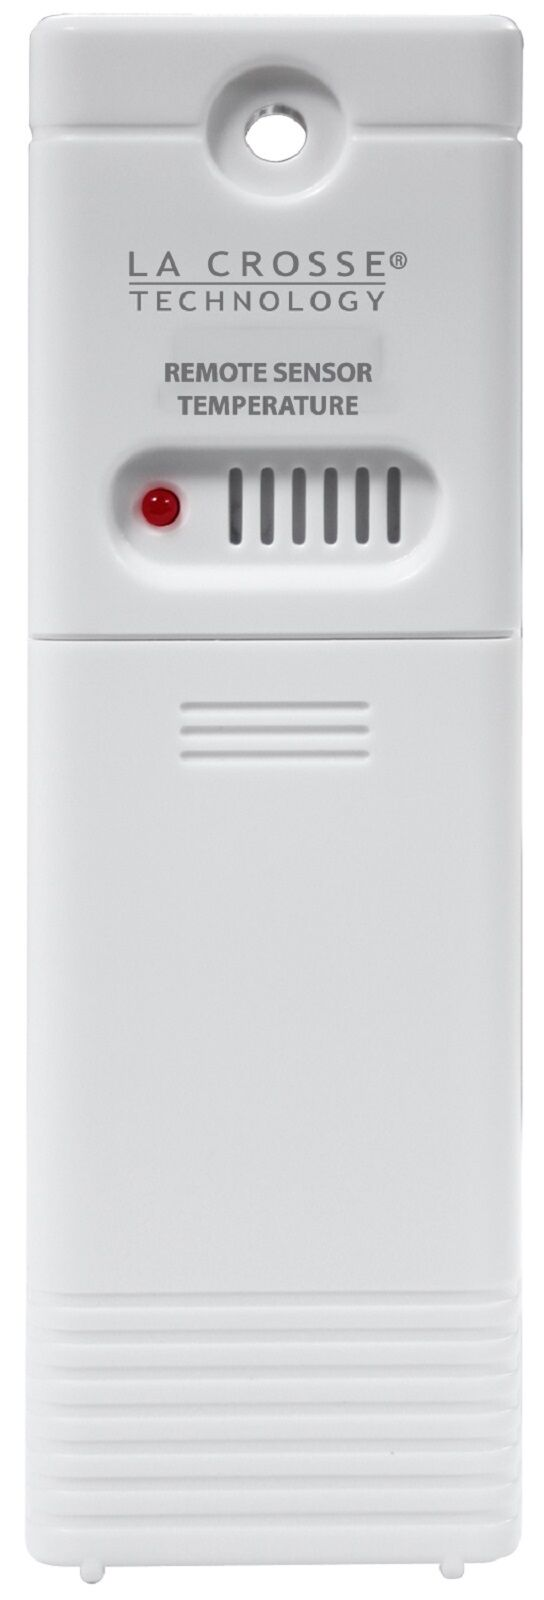 TX141V2 La Crosse Technology Wireless Temperature Sensor